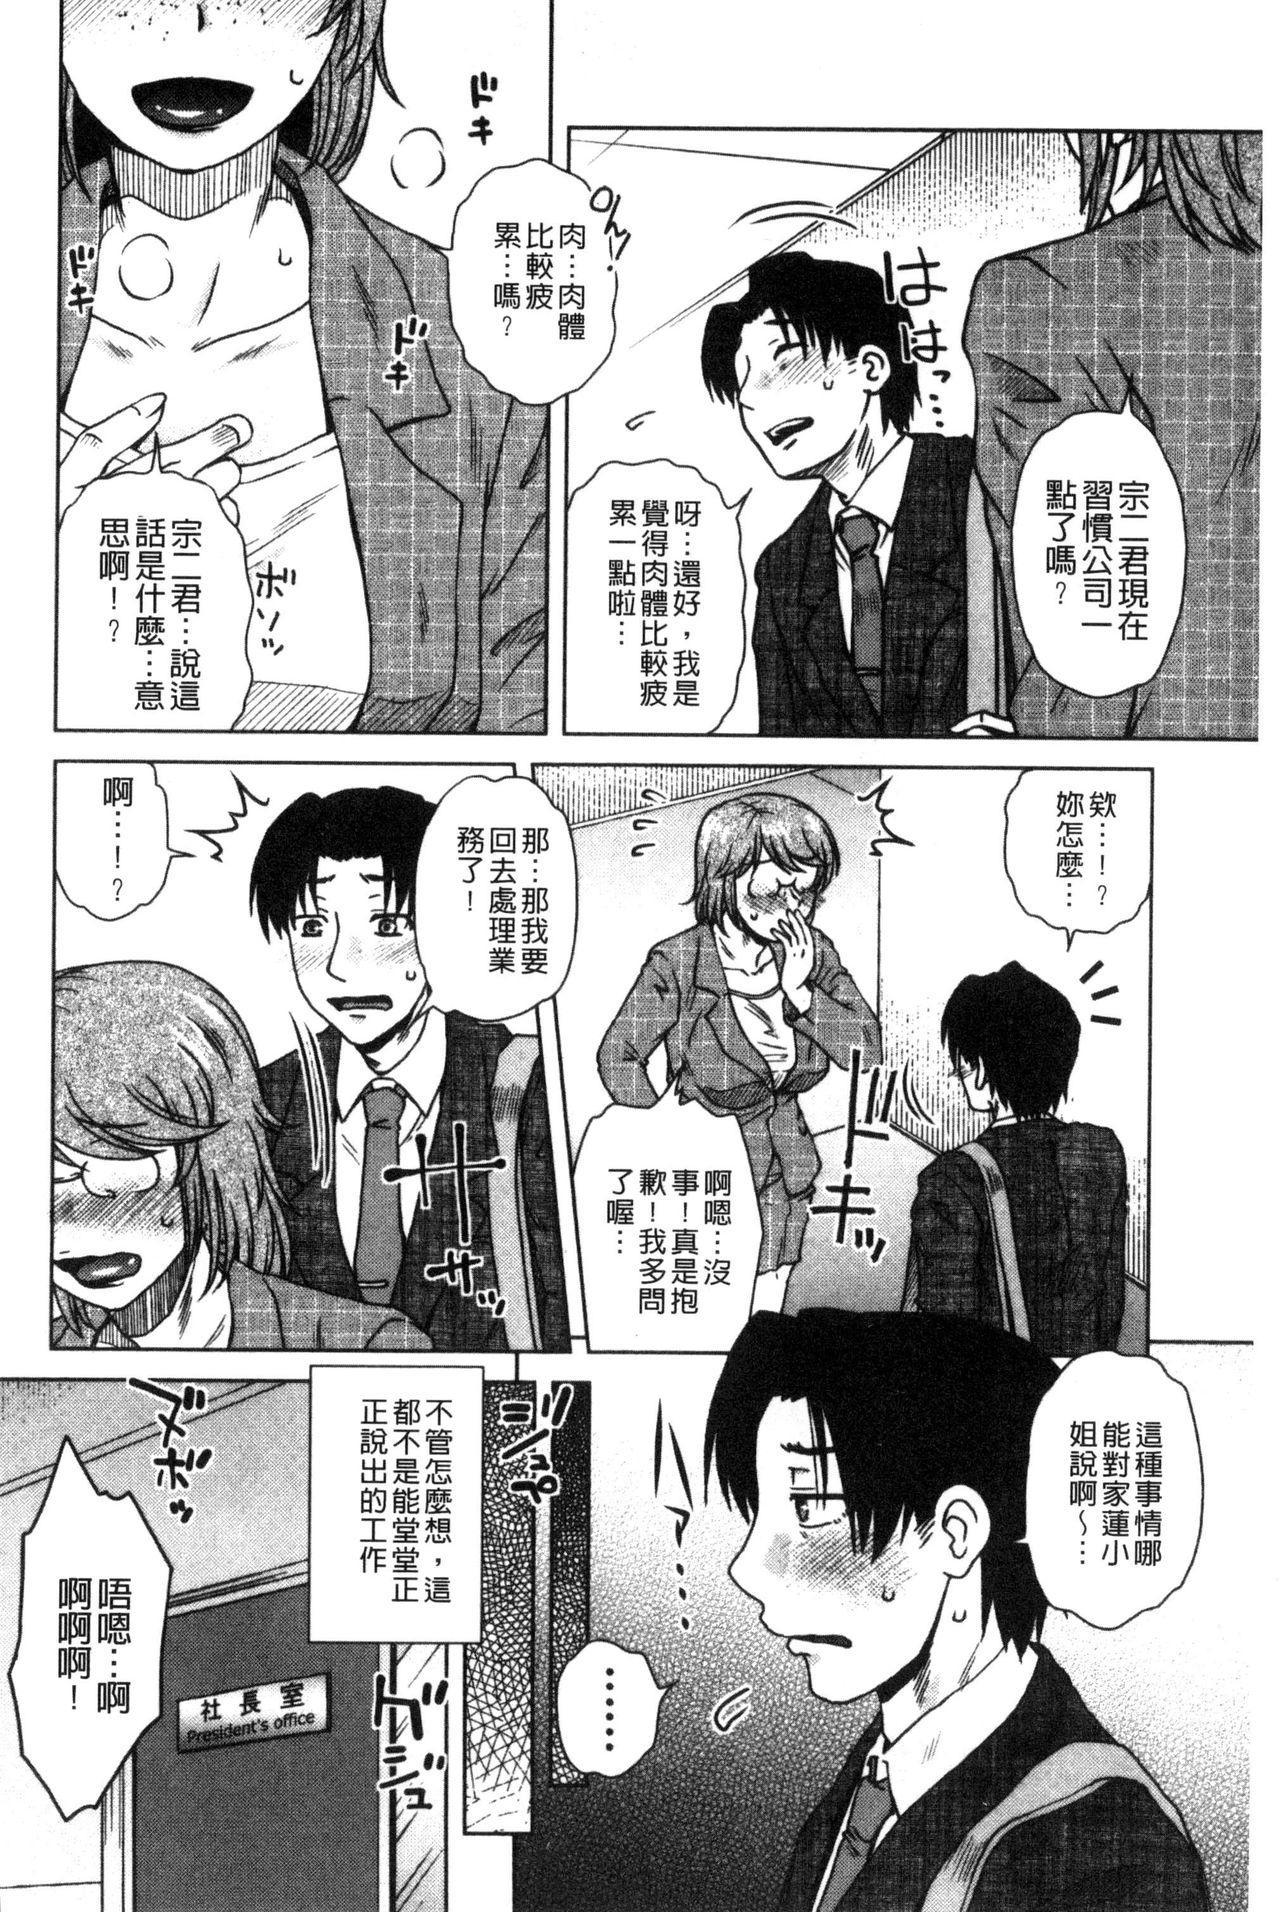 [Kurumiya Mashimin] Uchi no Shachou no Hamedere Inkatsu - Our President is HAME-DERE in Licentious sex life. [Chinese] 28